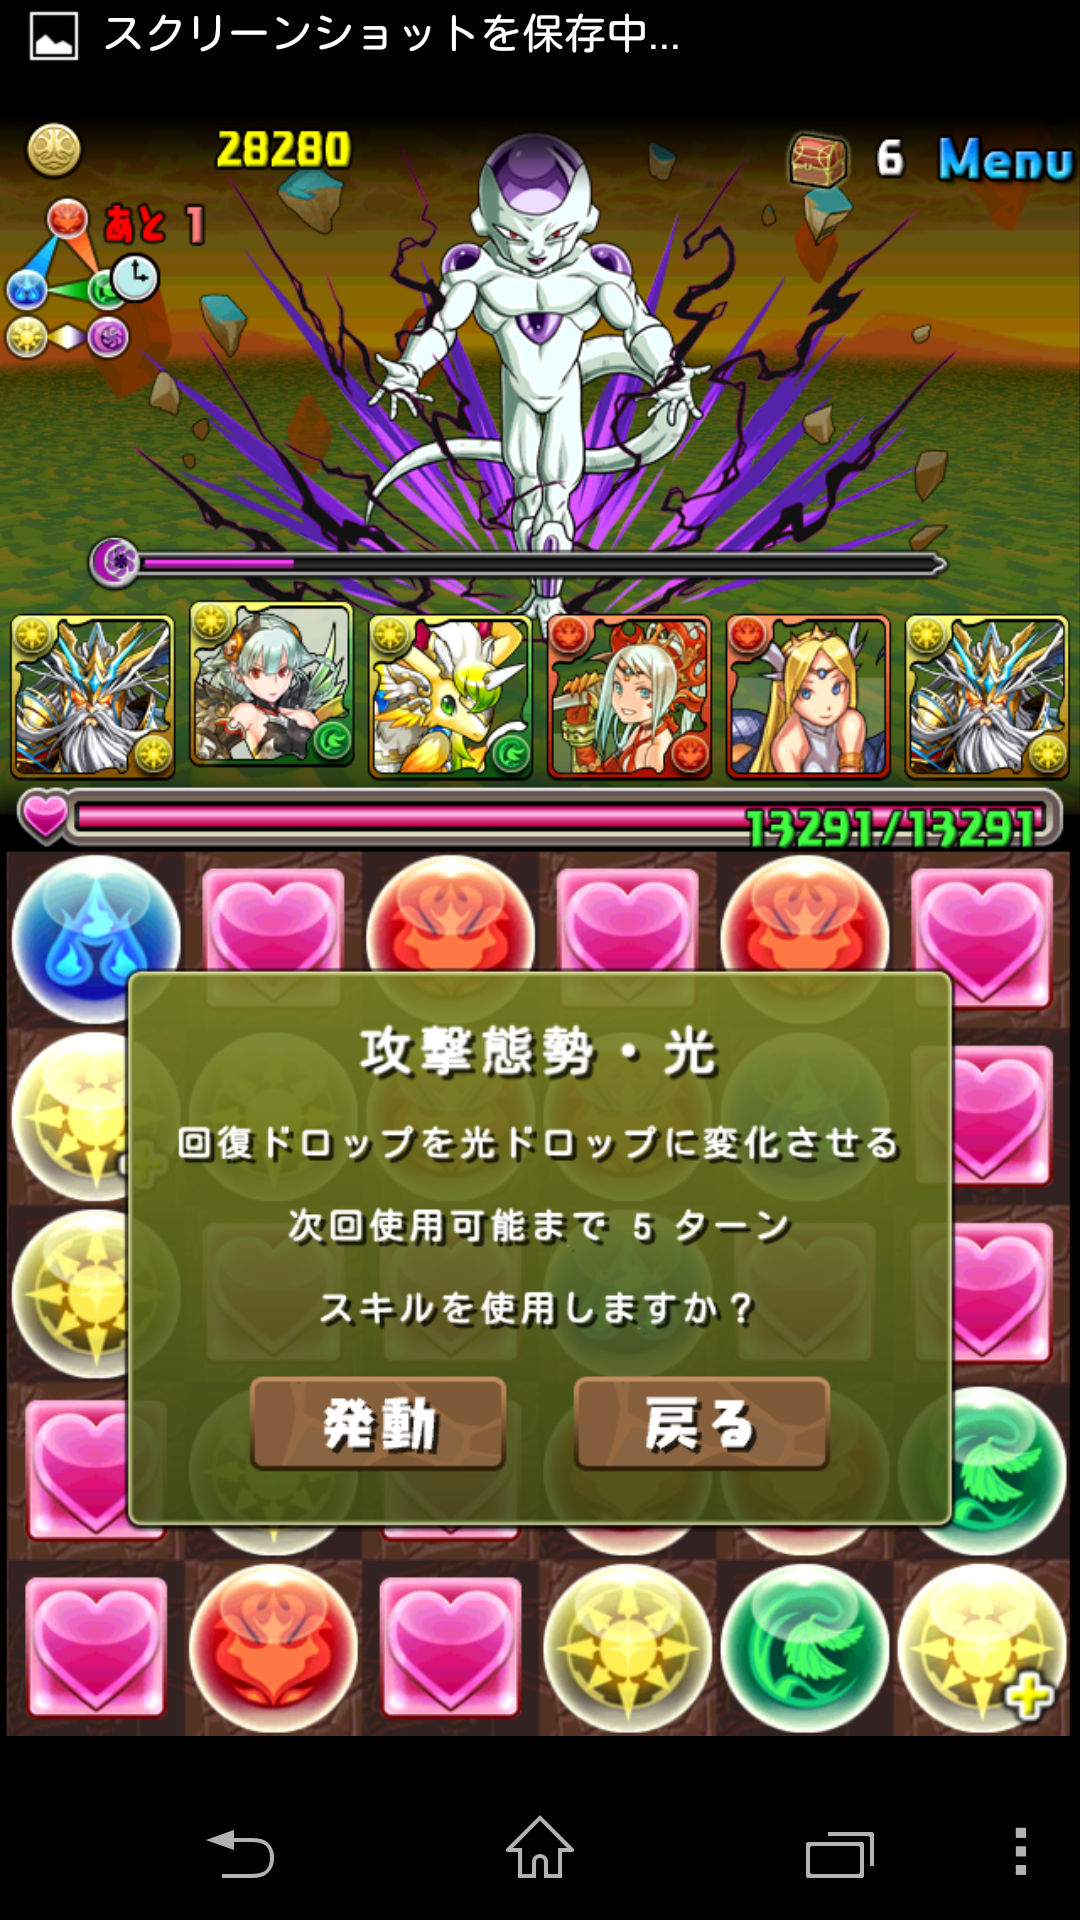 Screenshot_2014-06-06-04-02-51.png